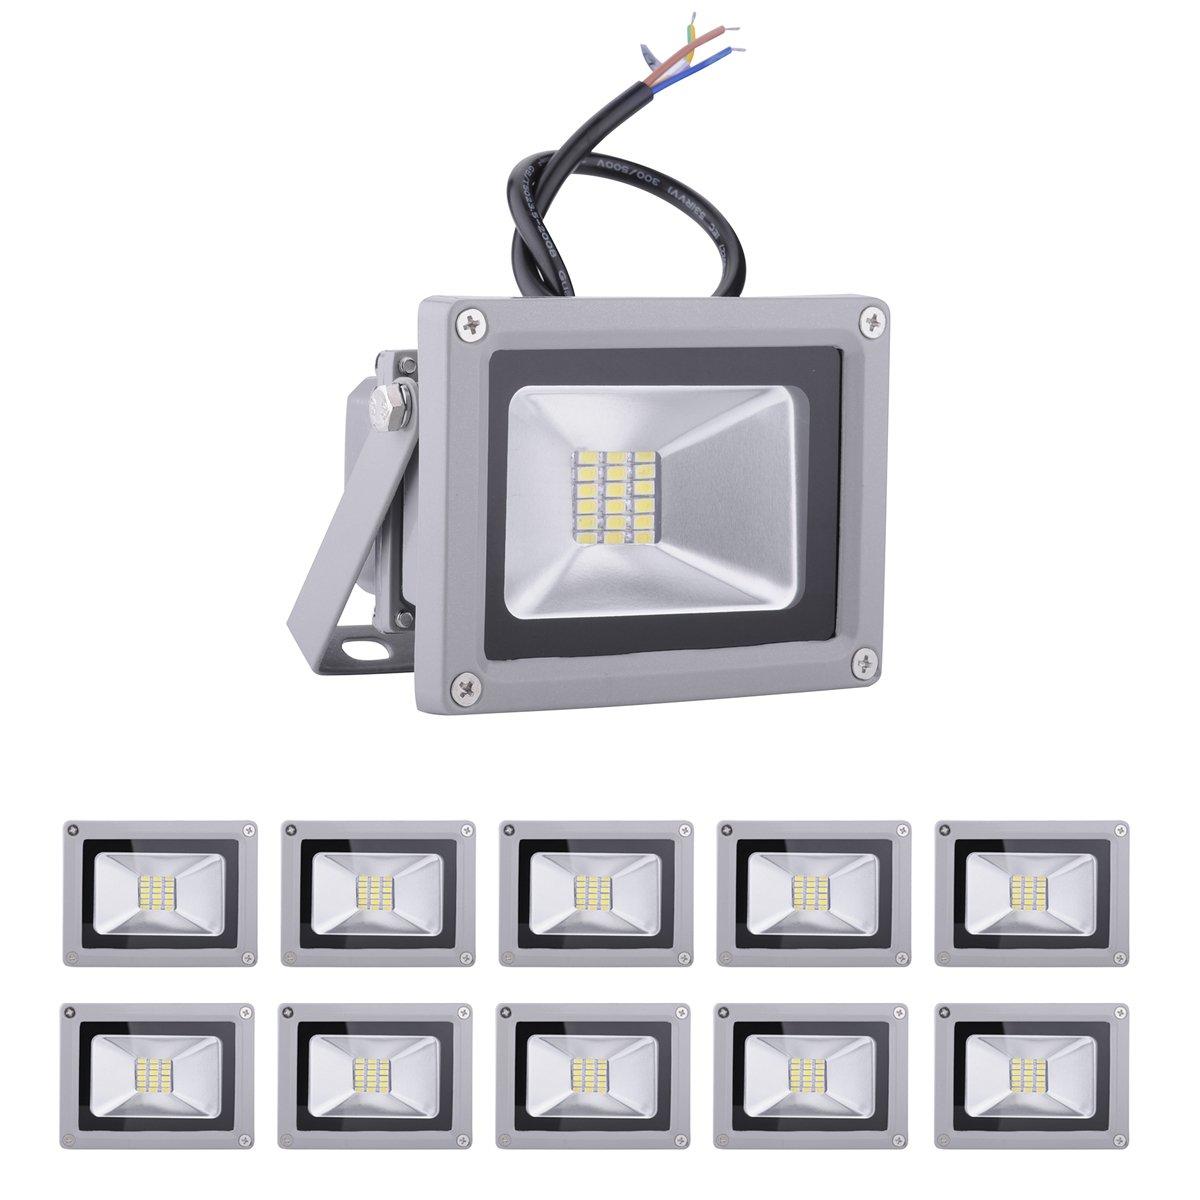 Rondaful】10x 20W LED Fluter Aussenstrahler SMD Wandstrahler Spots ...